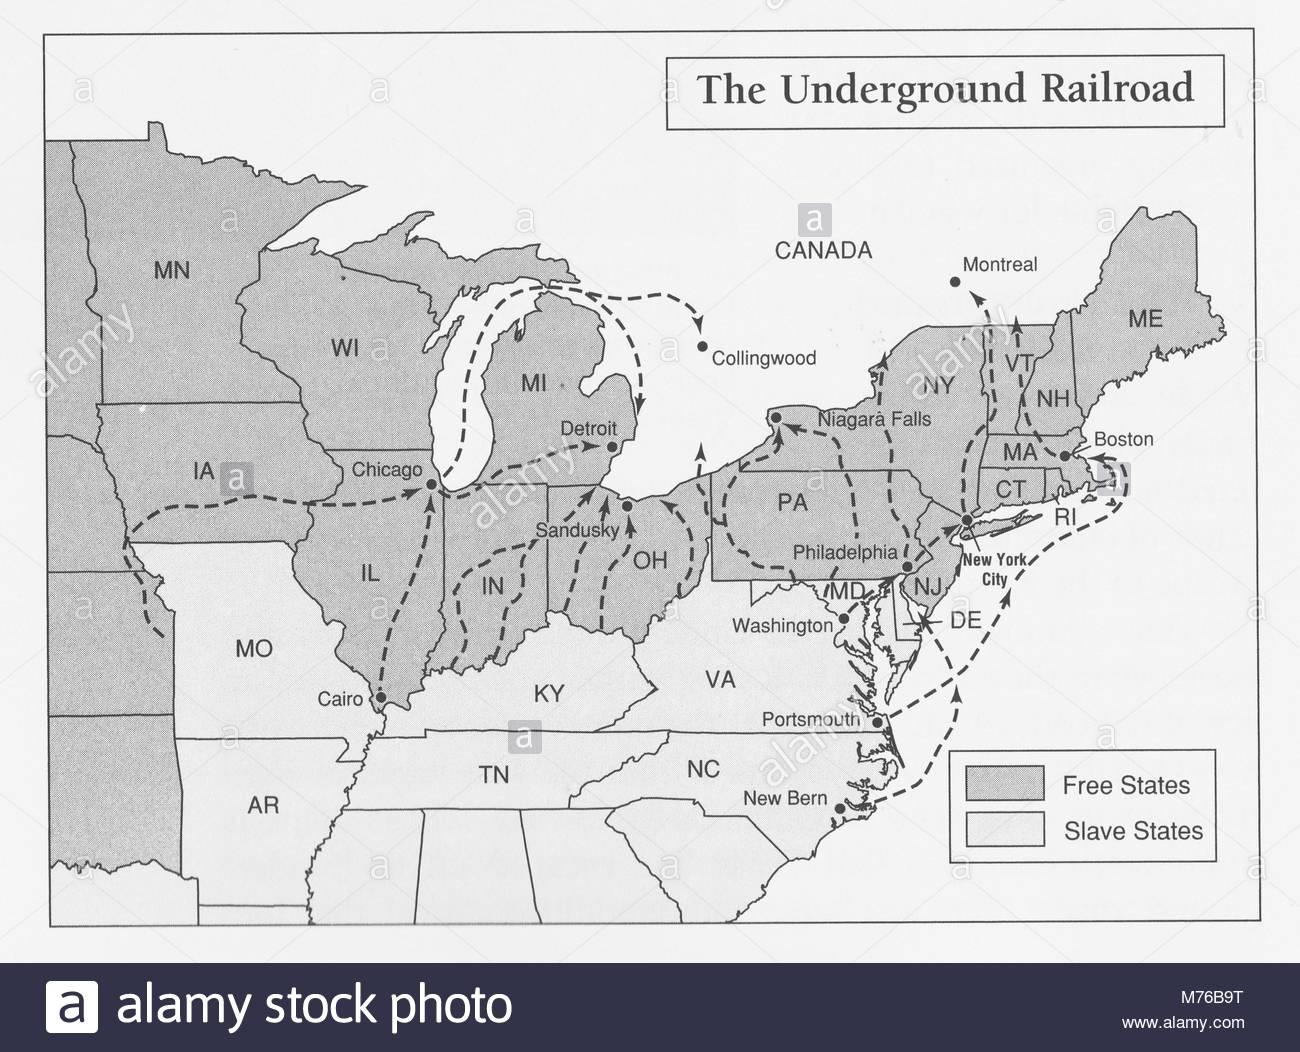 Underground Railroad Stock Photos Amp Underground Railroad Stock Images